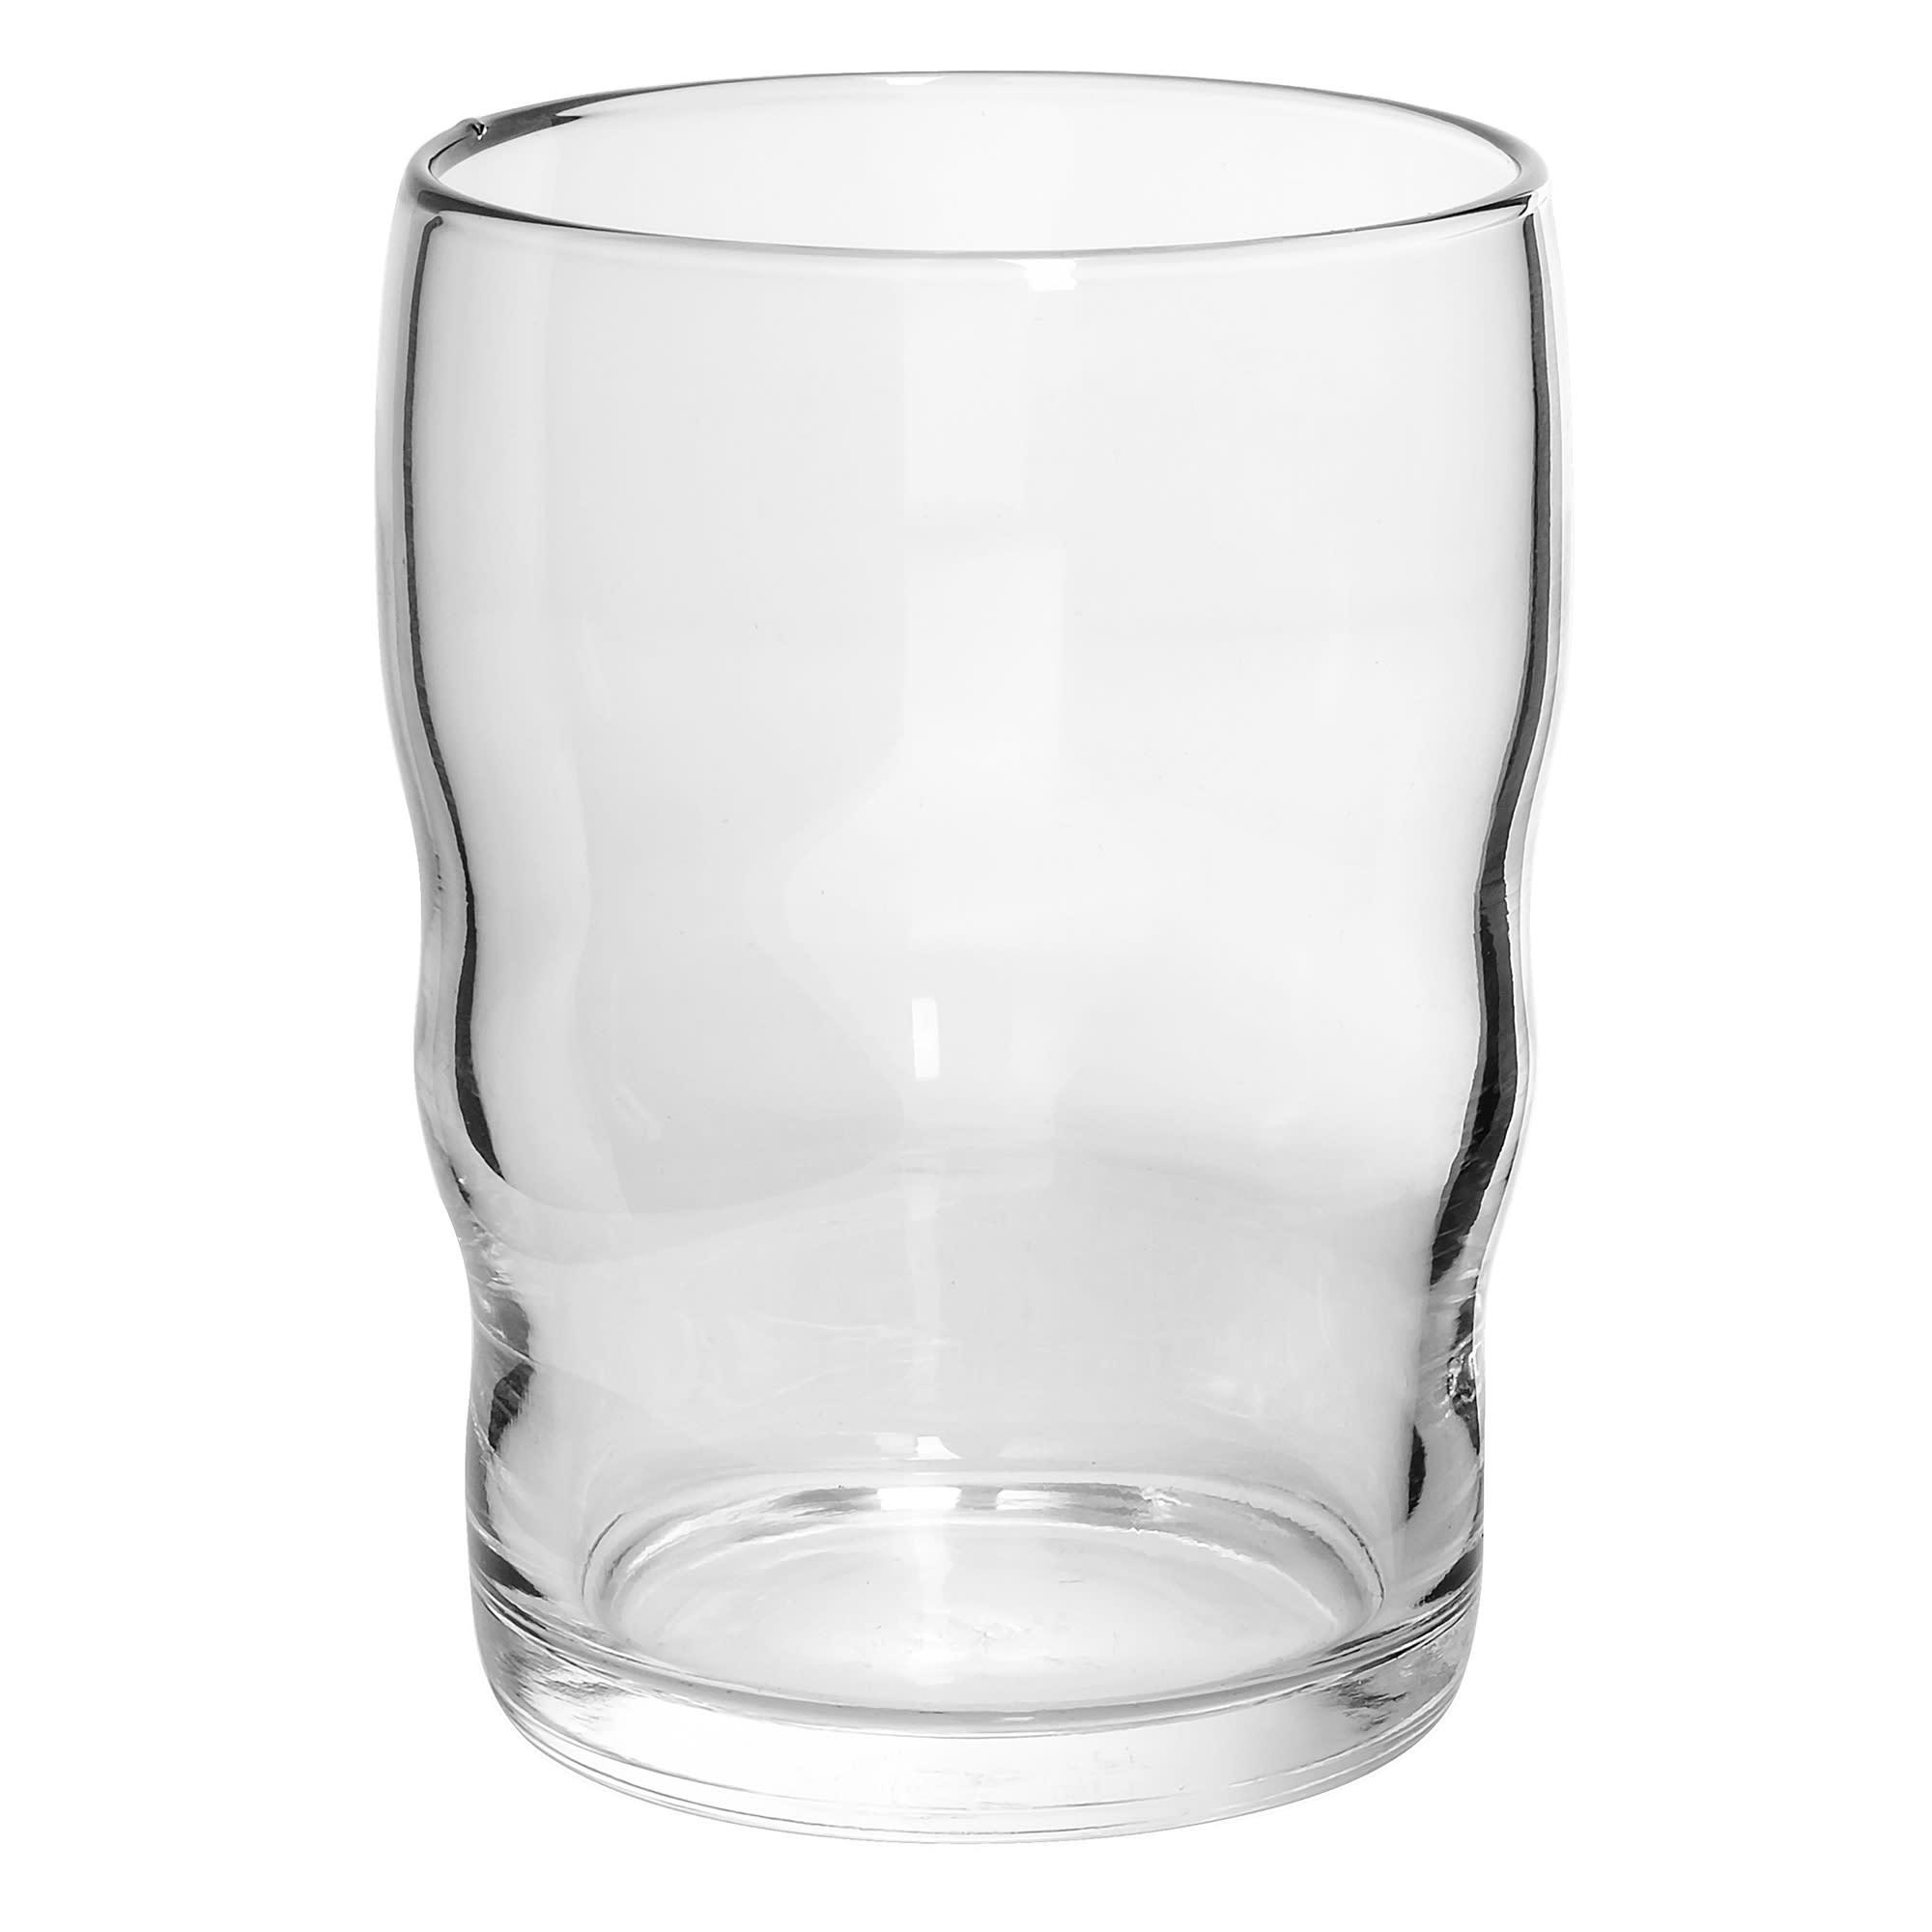 Libbey 618HT 8 oz Governor Clinton Beverage Glass - Safedge Rim